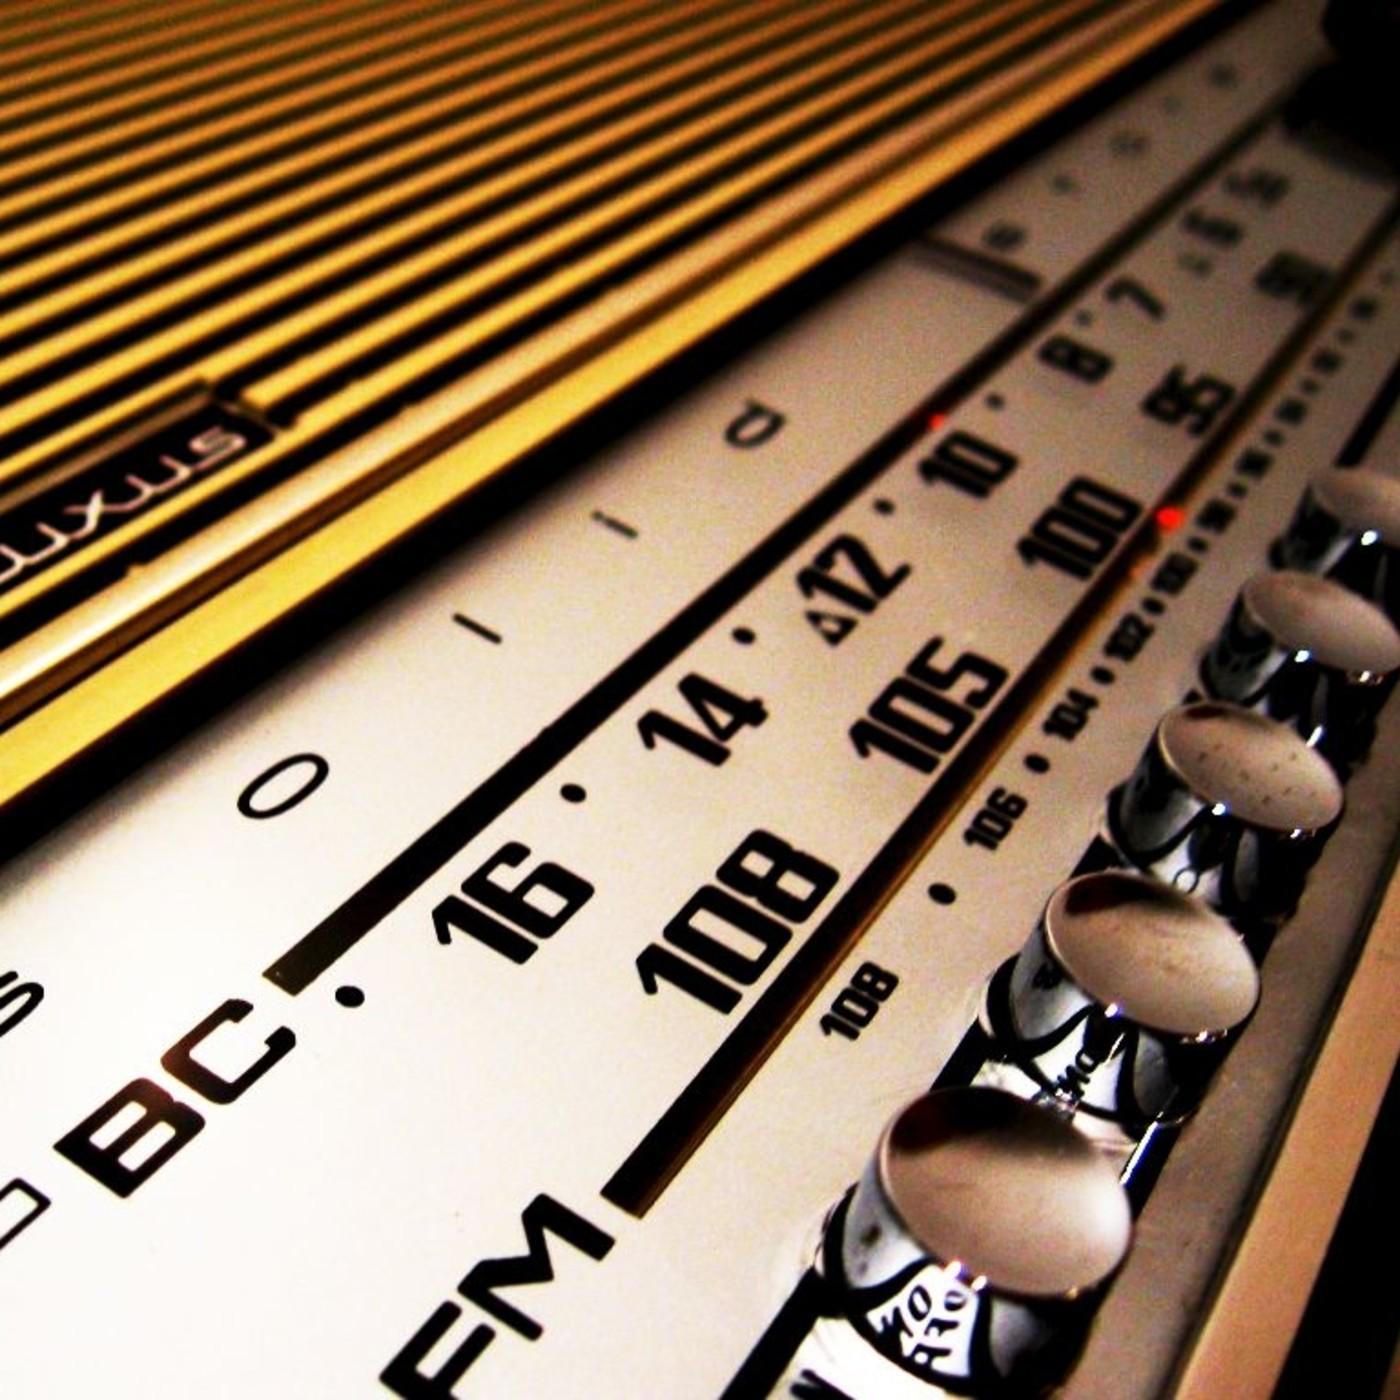 Radioyente